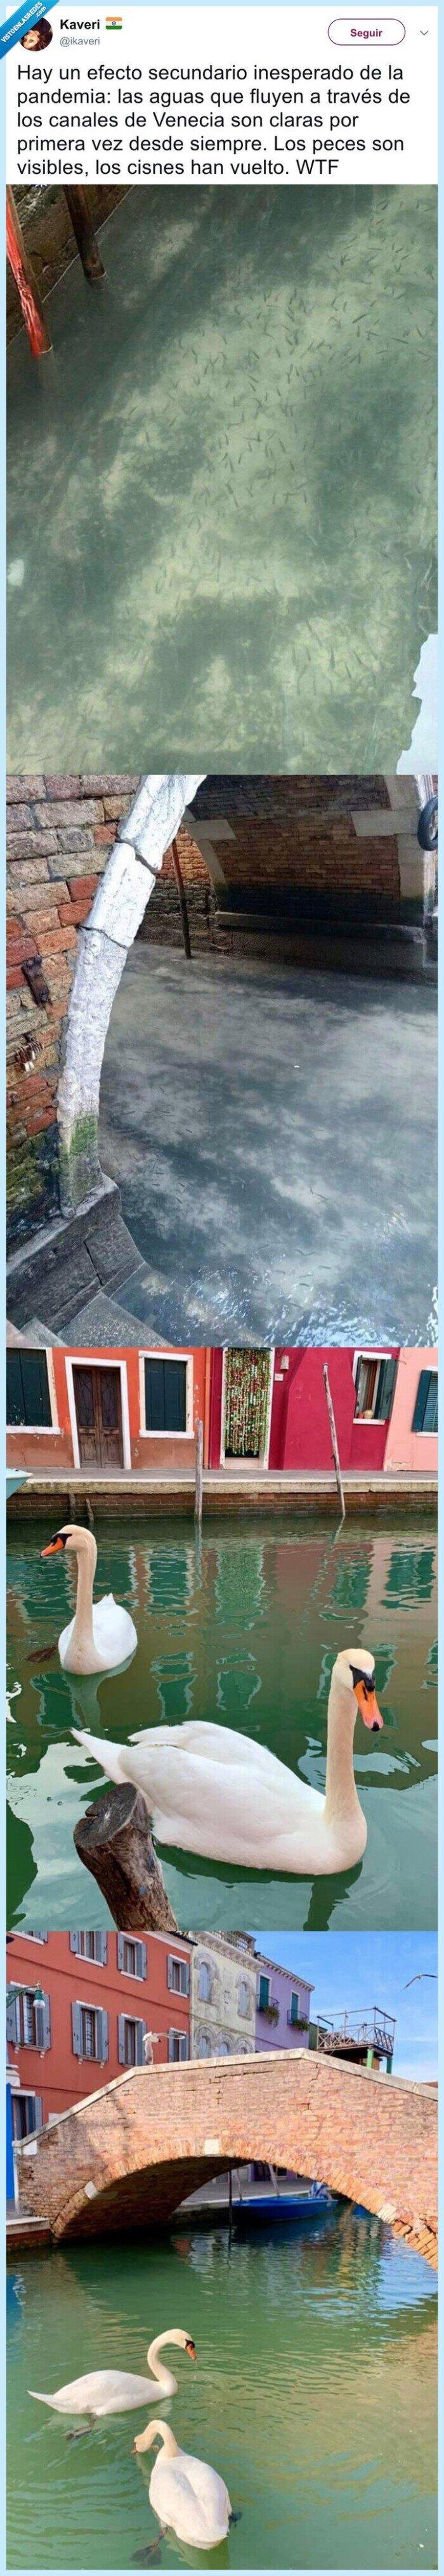 agua,canales,coronavirus,extinguirse,fauna,venecia